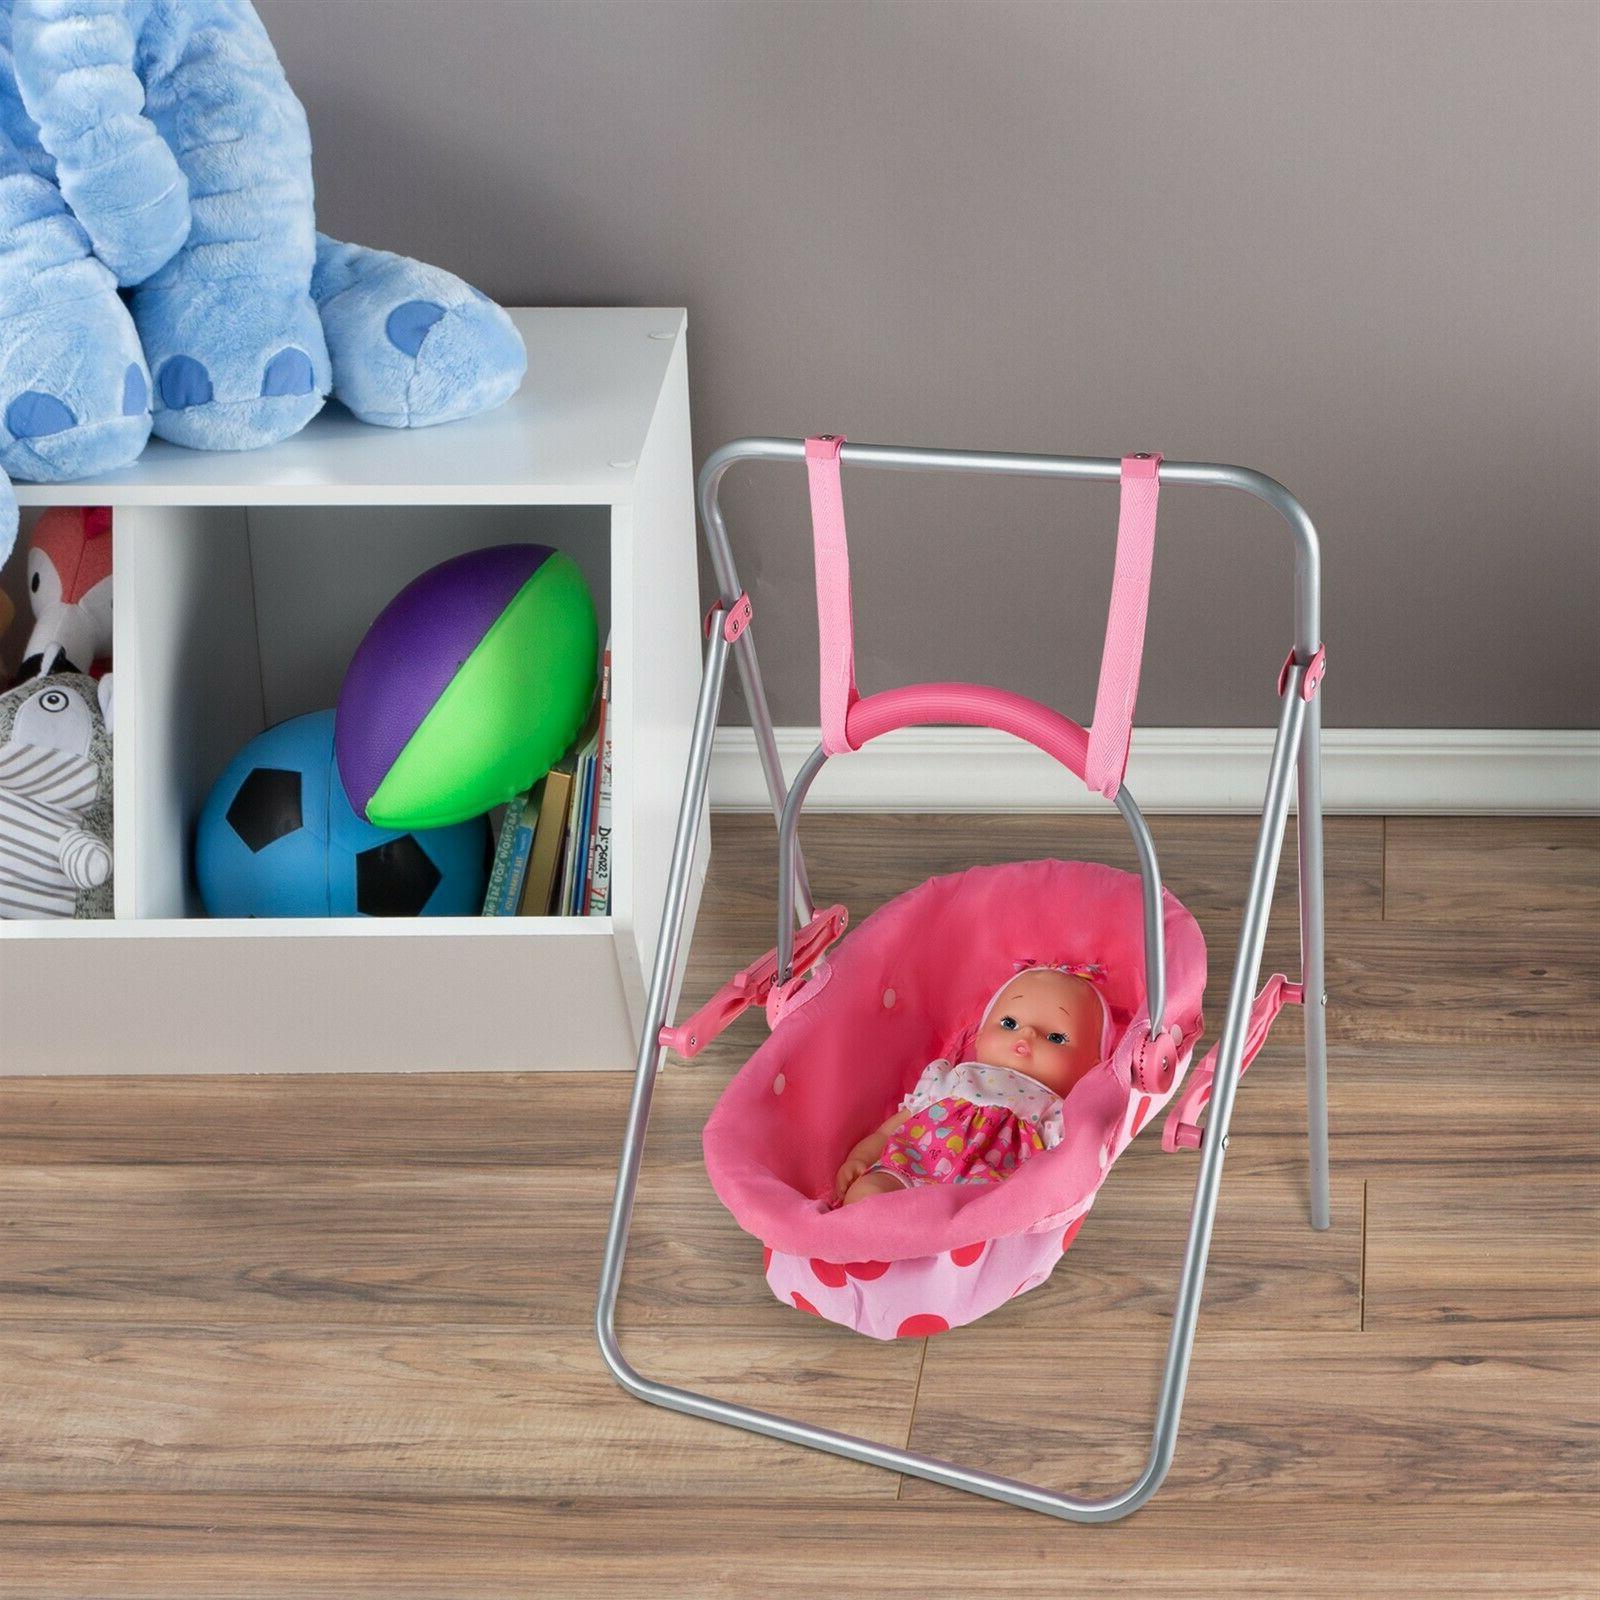 2 in 1 baby doll swing carrier